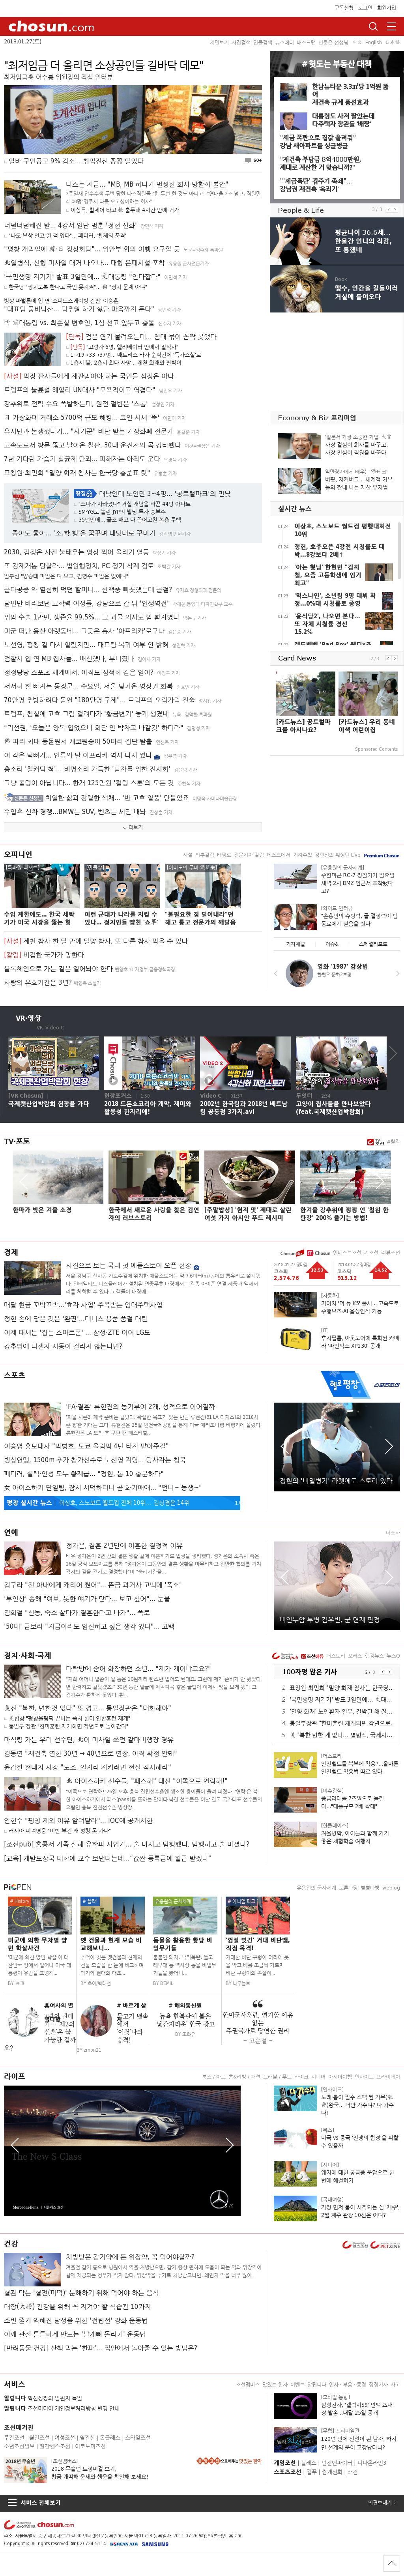 chosun.com at Saturday Jan. 27, 2018, 2:02 a.m. UTC